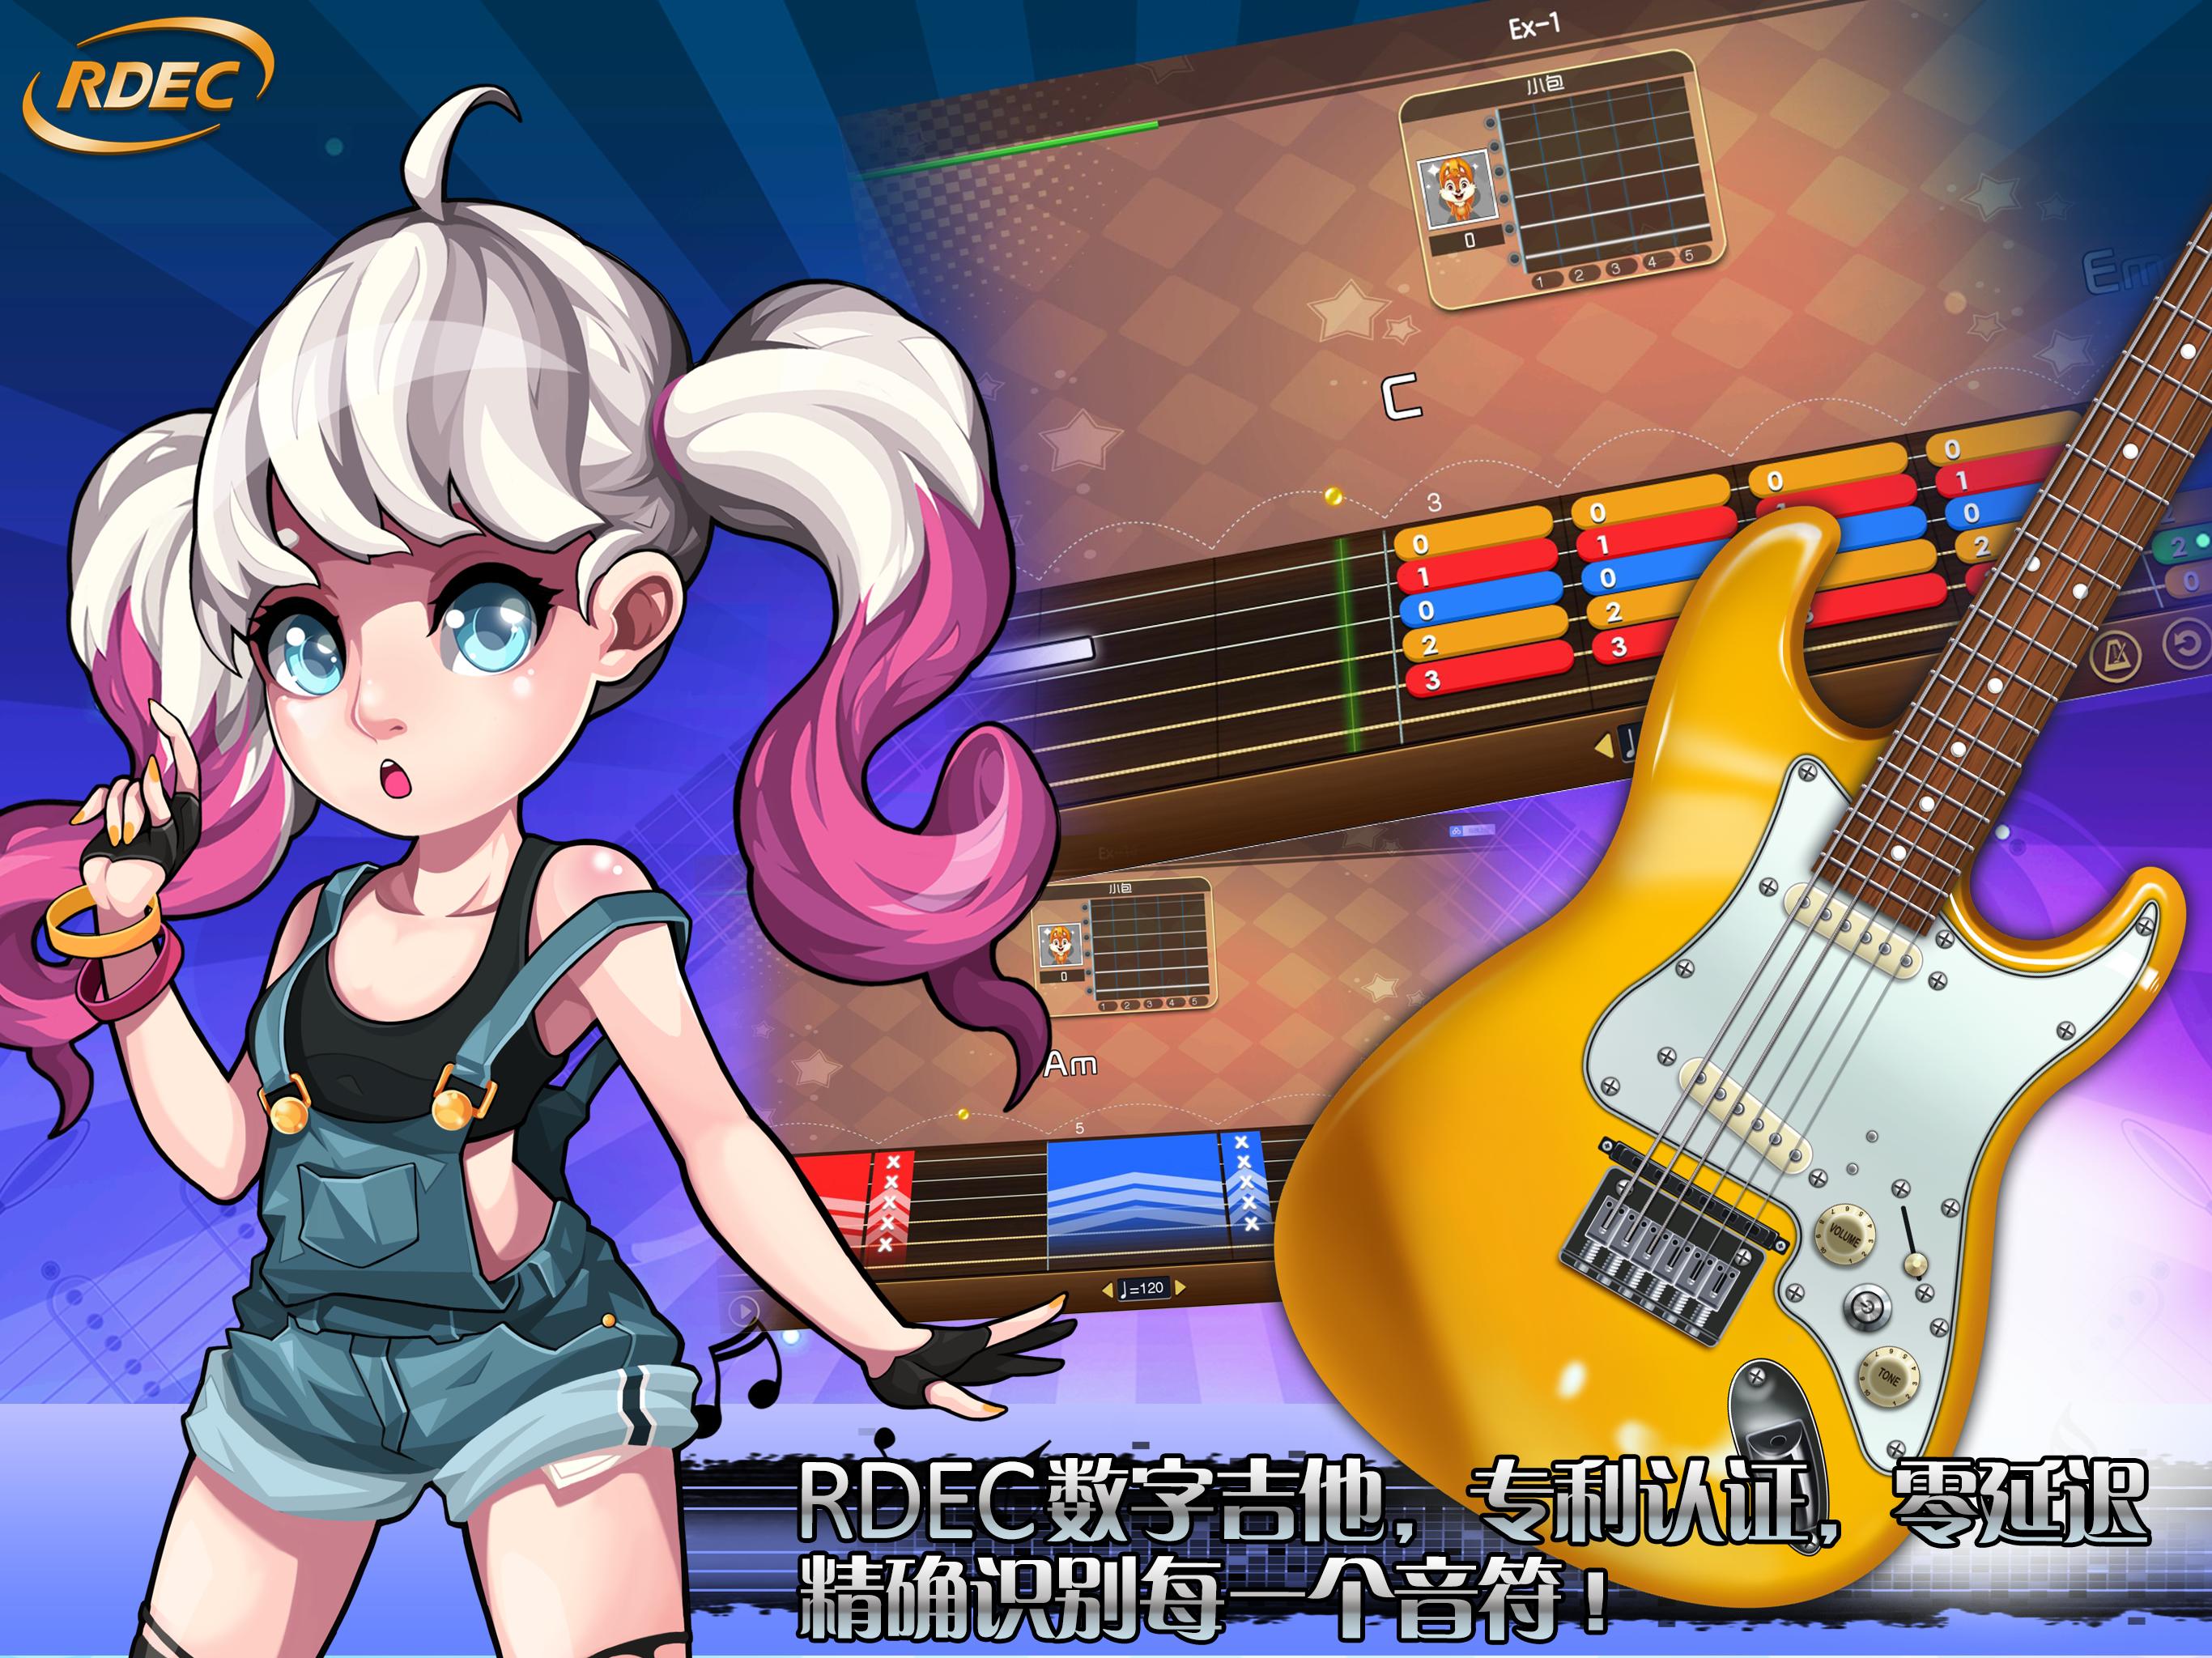 RDEC智能电吉他家庭版